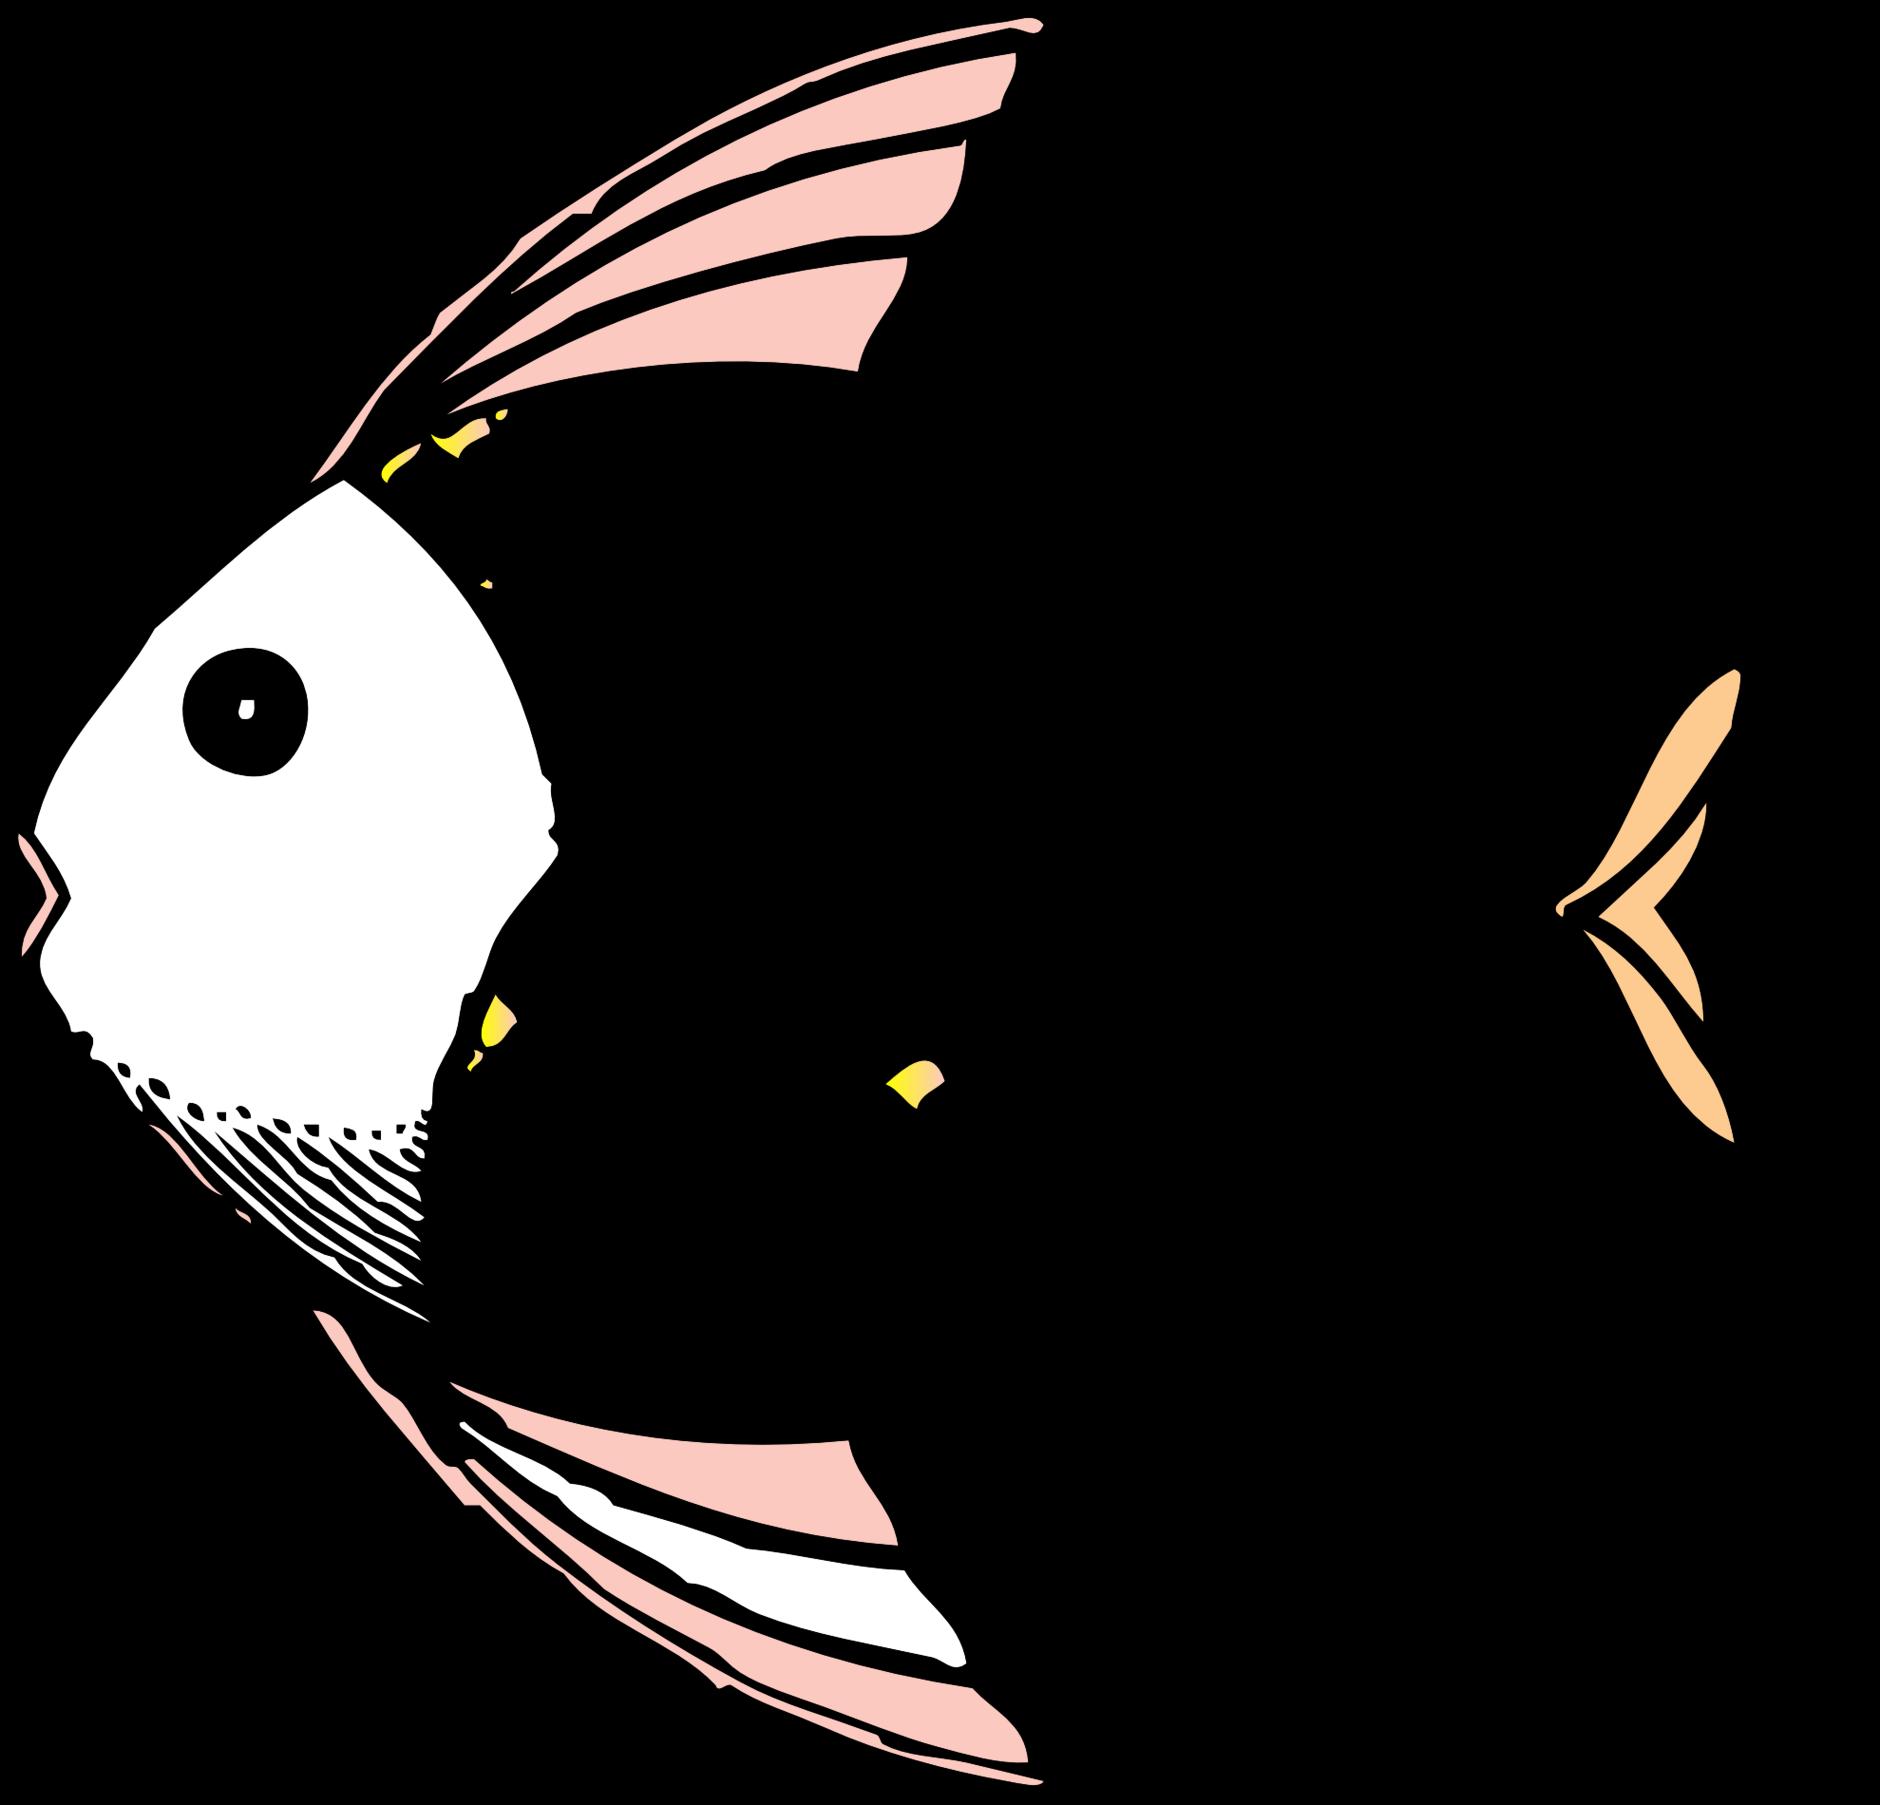 1880x1805 Fish Line Drawings Kids Coloring